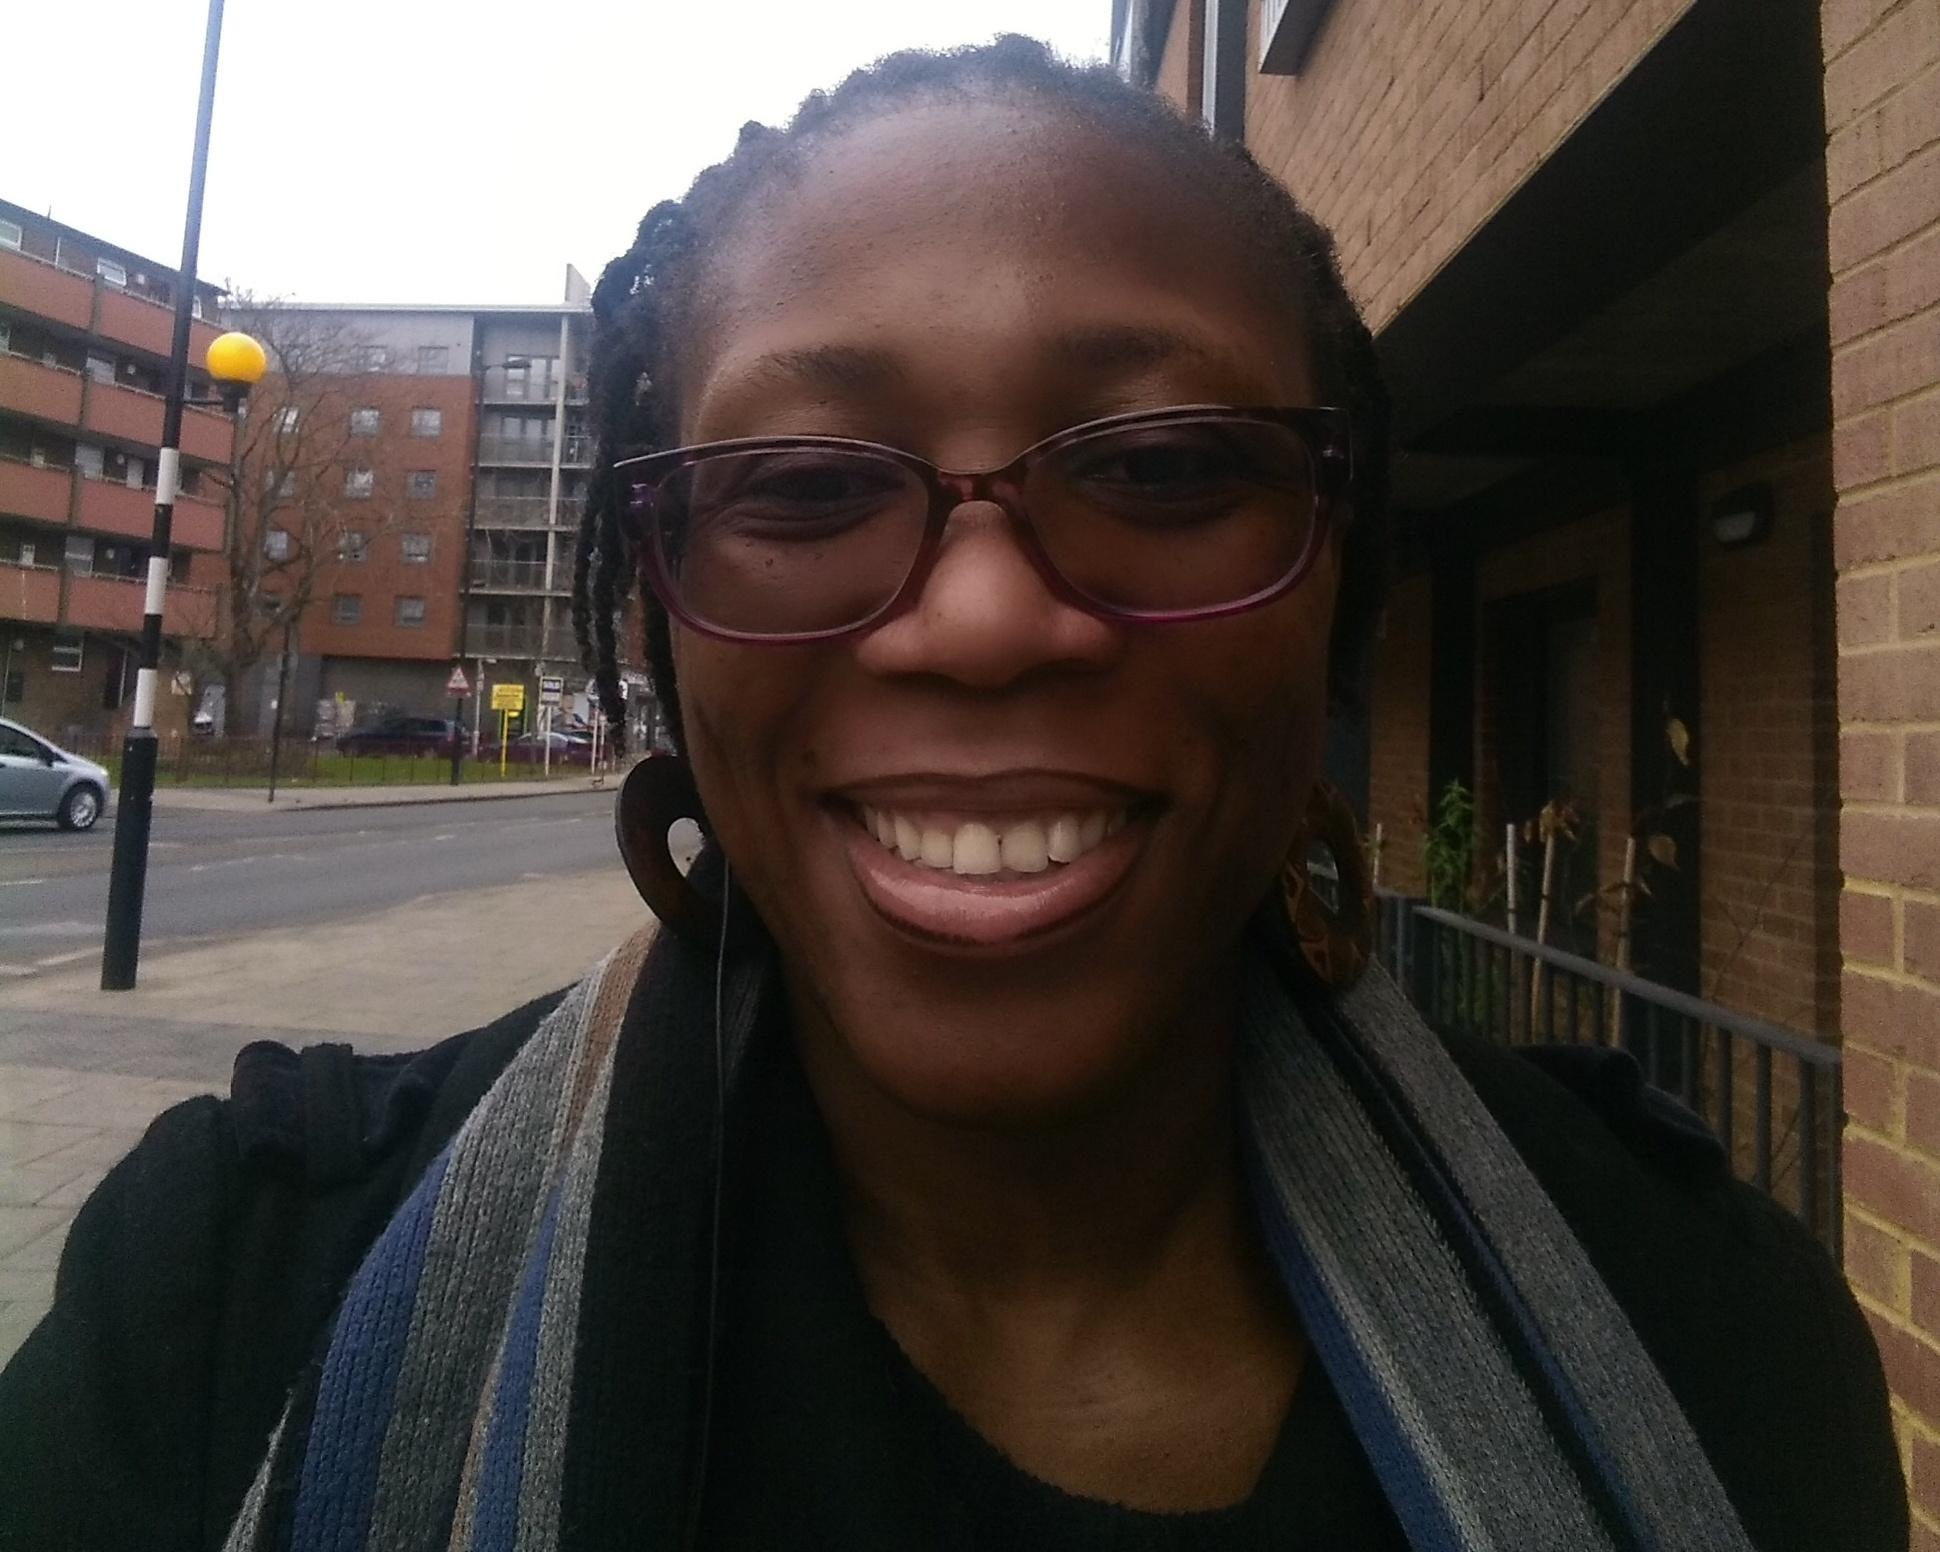 Smiling selfie of FareShare London volunteer Venessa